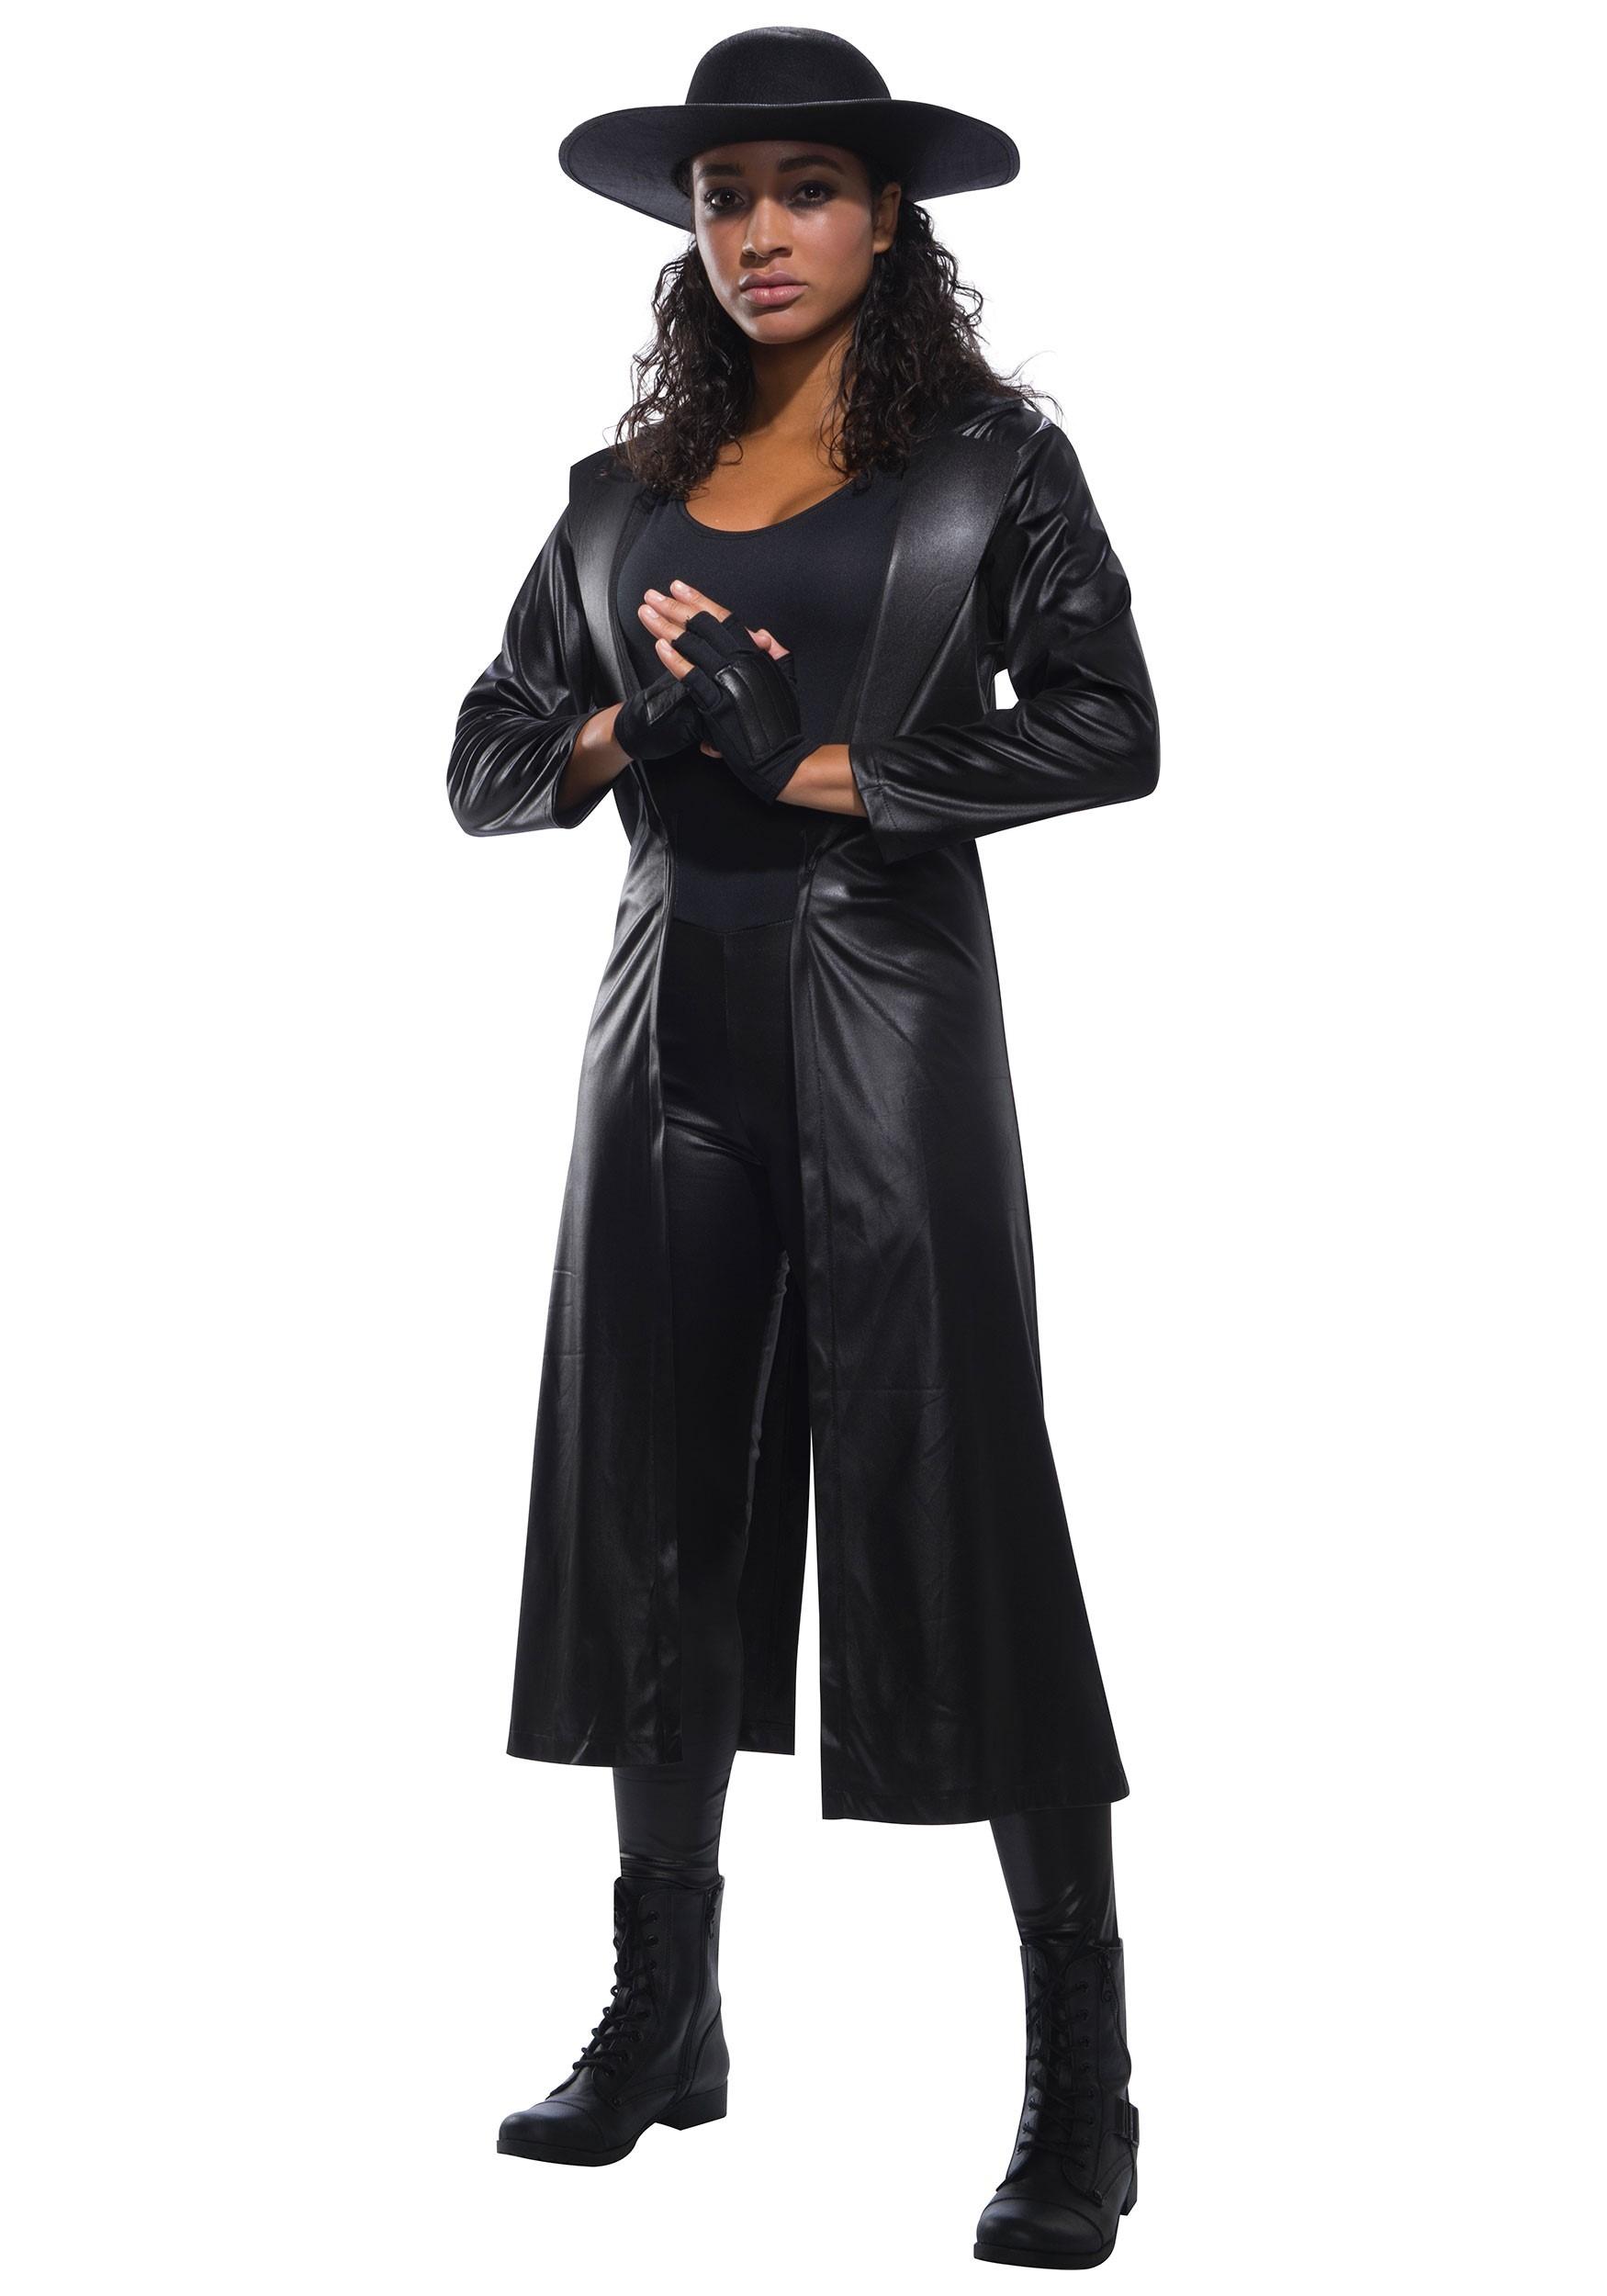 WWE Undertaker Costume for Women